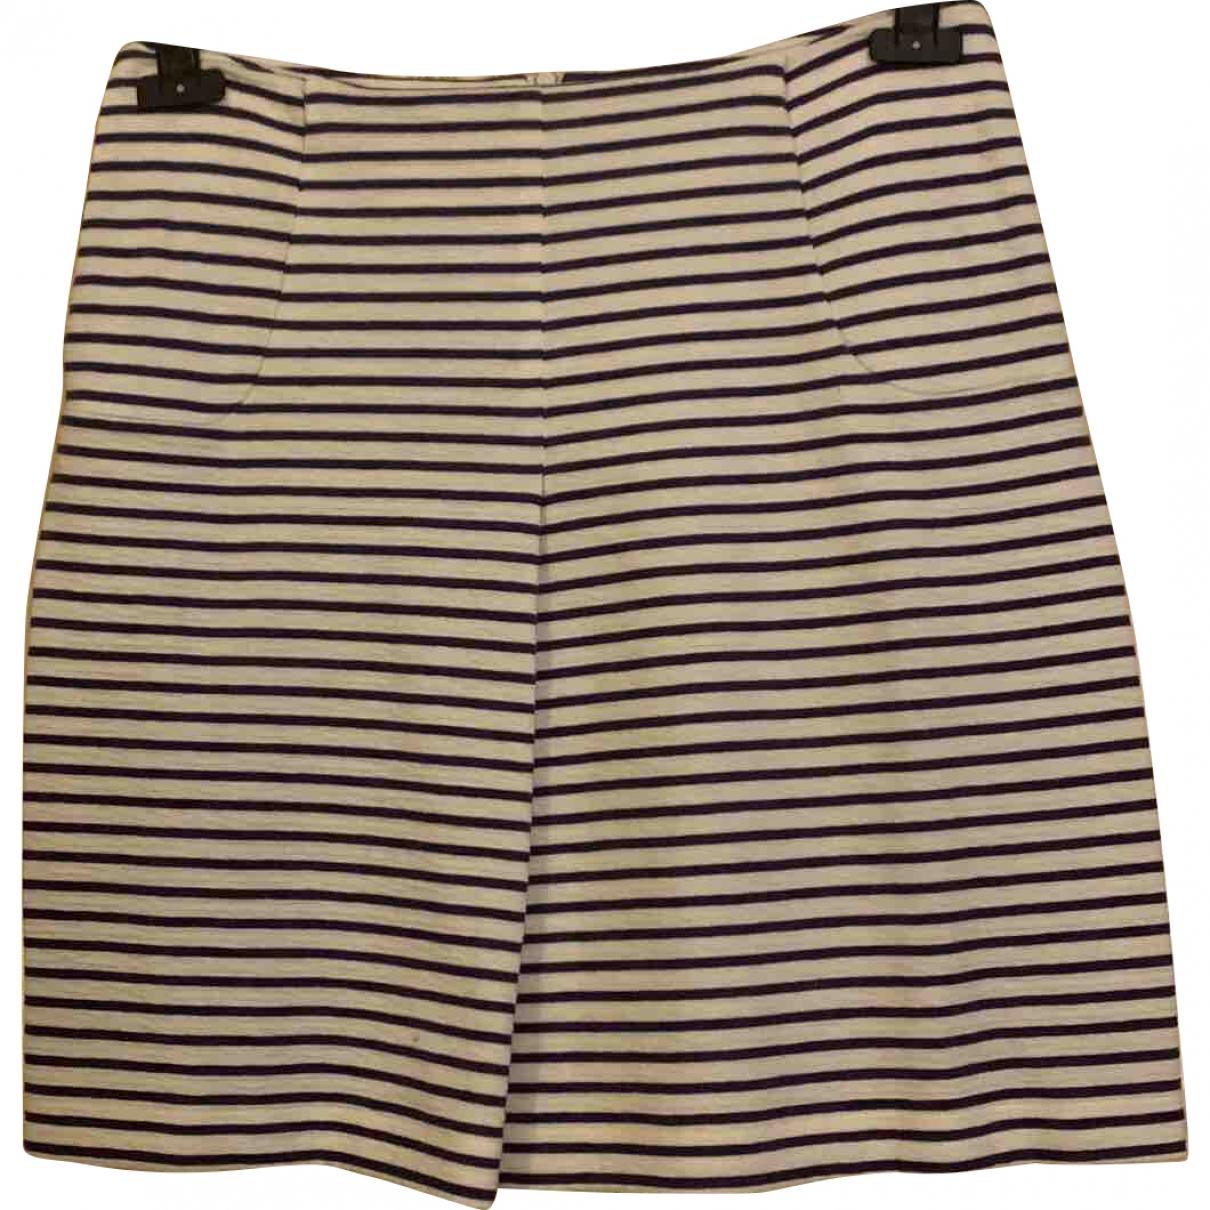 Cacharel \N Ecru Cotton skirt for Women 42 IT